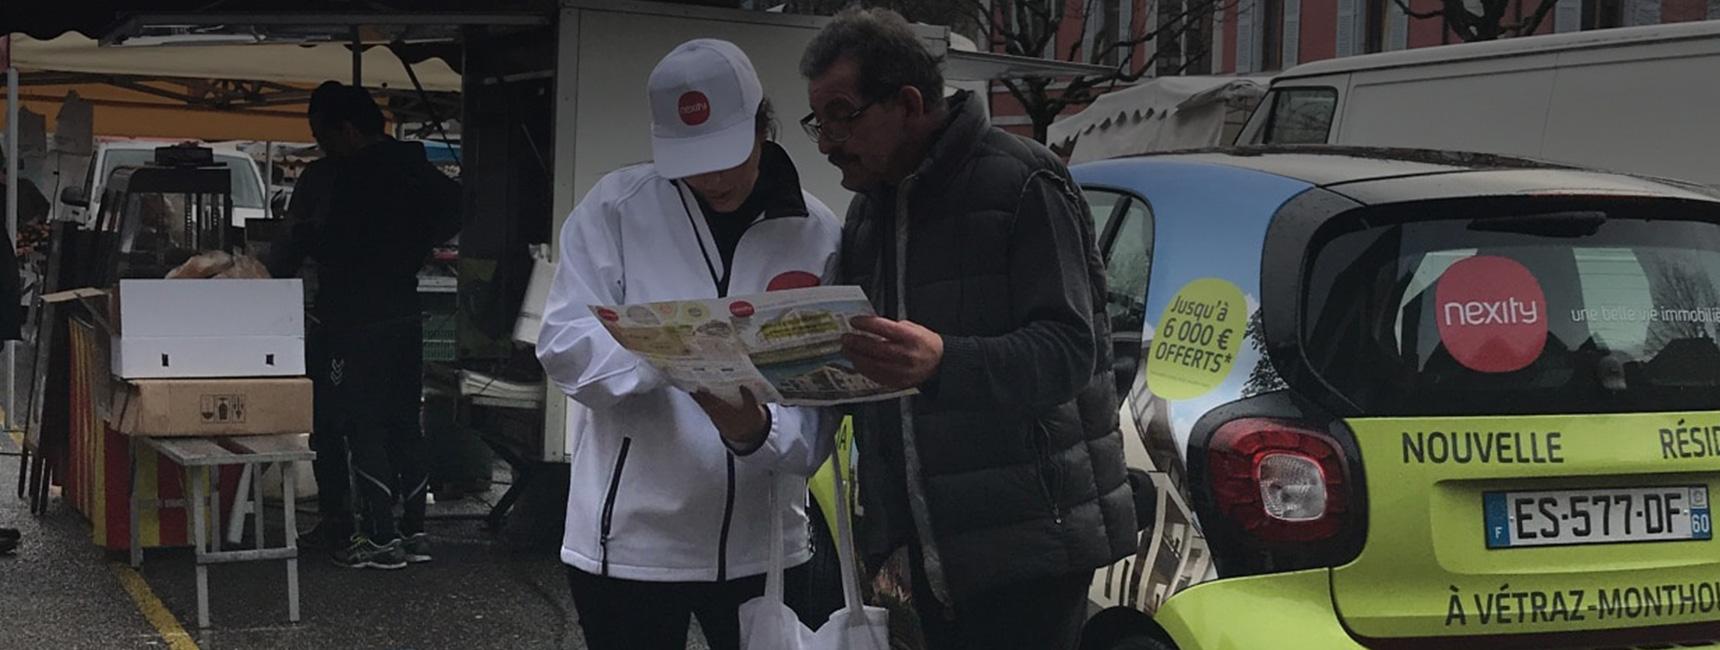 Nexity Affichage mobile street marketing Keemia Lyon Agence marketing local en région Rhônes Alpes